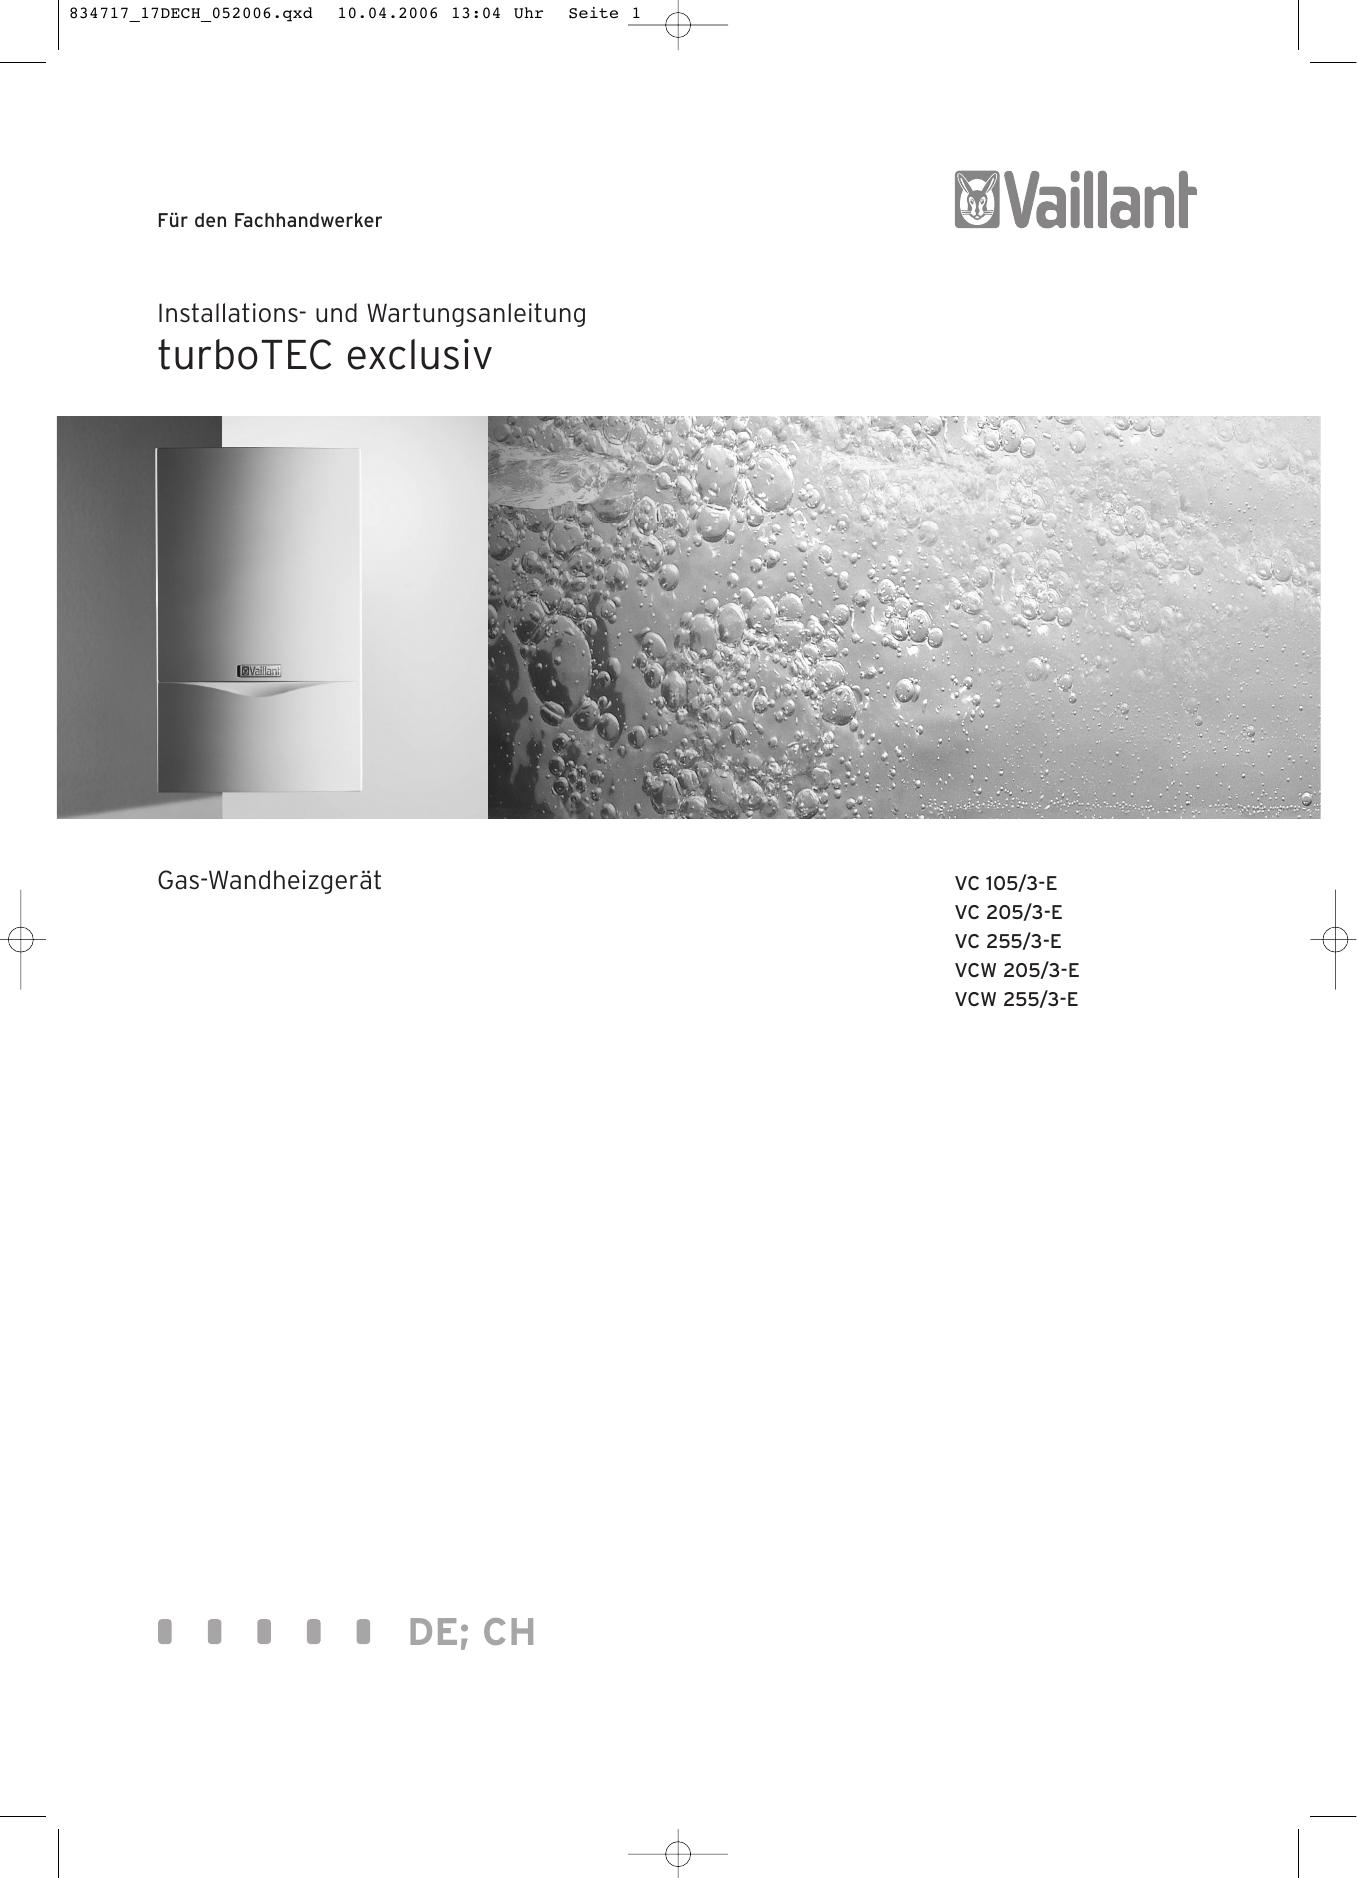 Turbotec Exclusiv Manualzz Com